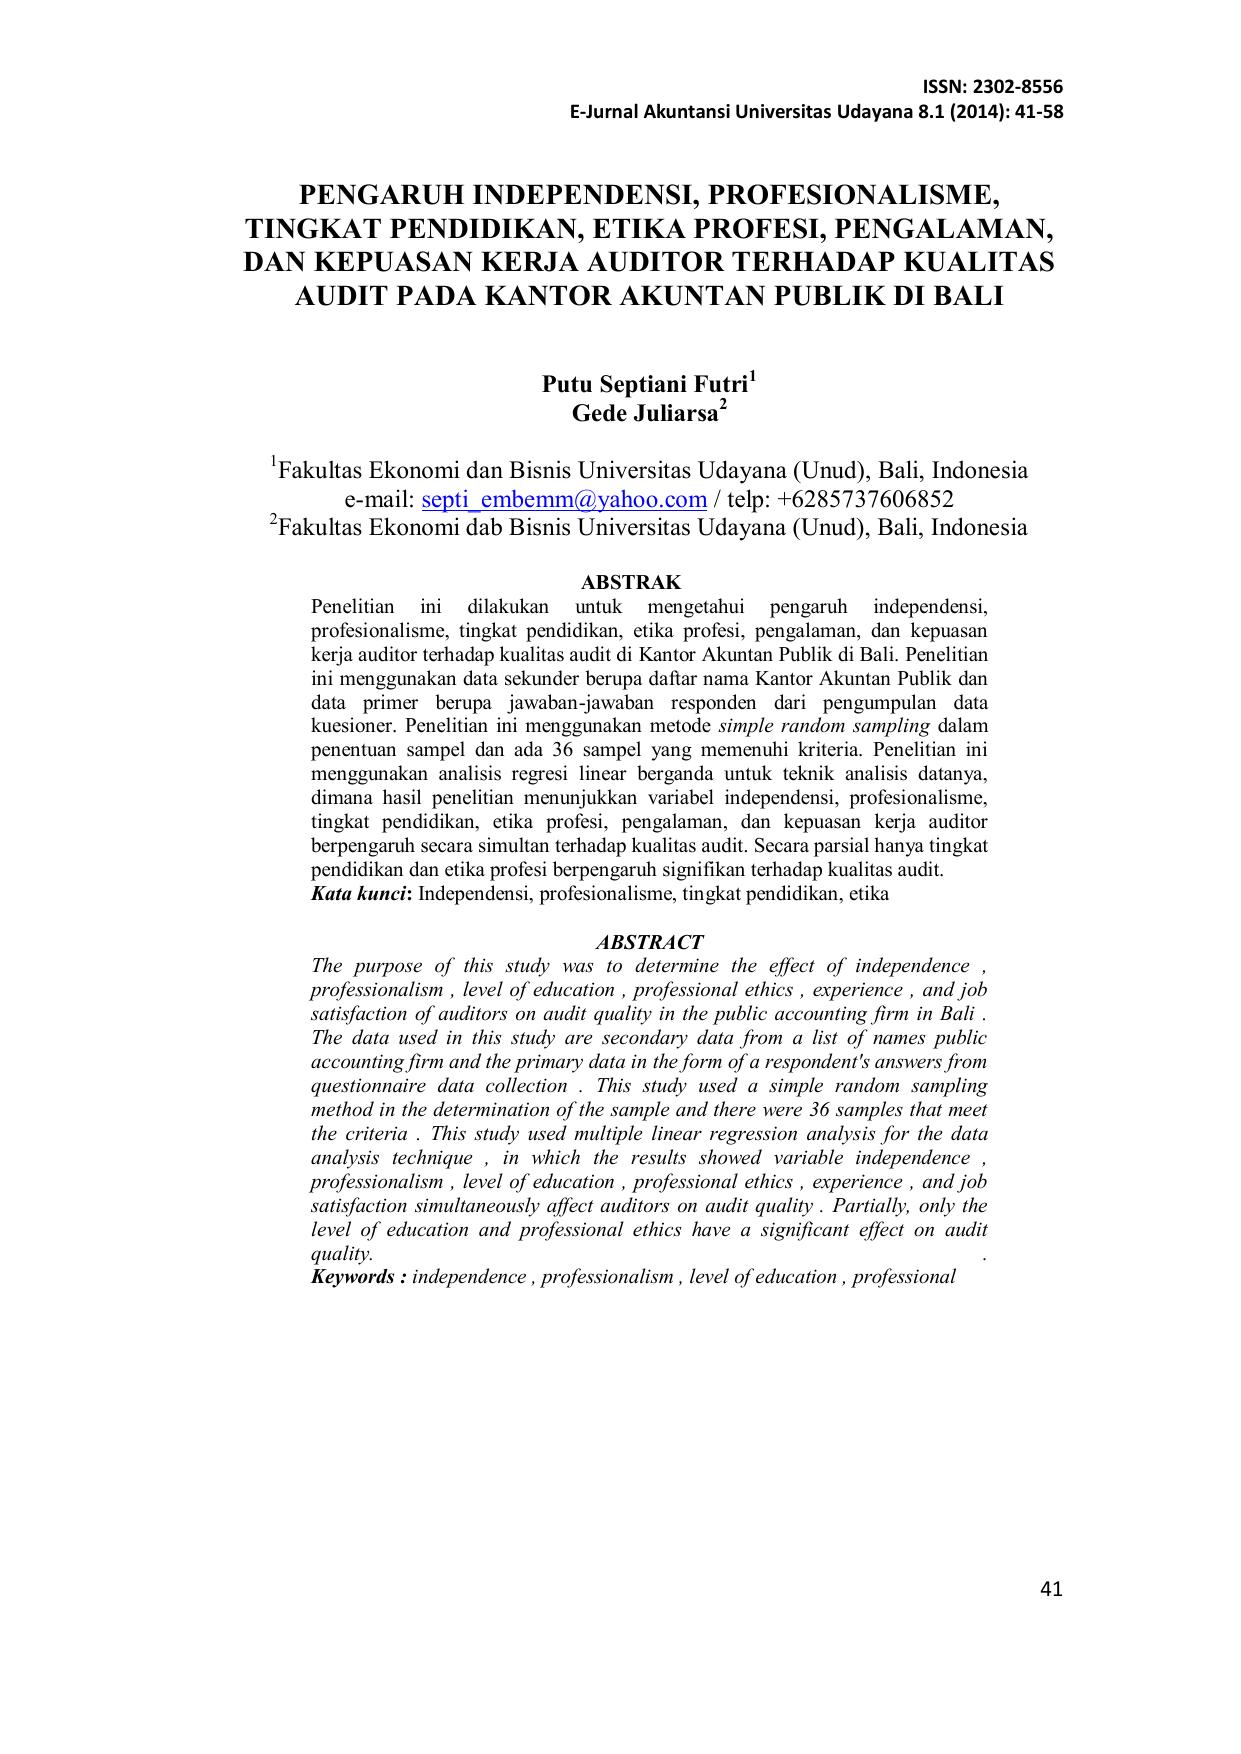 48+ Jurnal Ilmiah Audit Issn Background - GURU SD SMP SMA